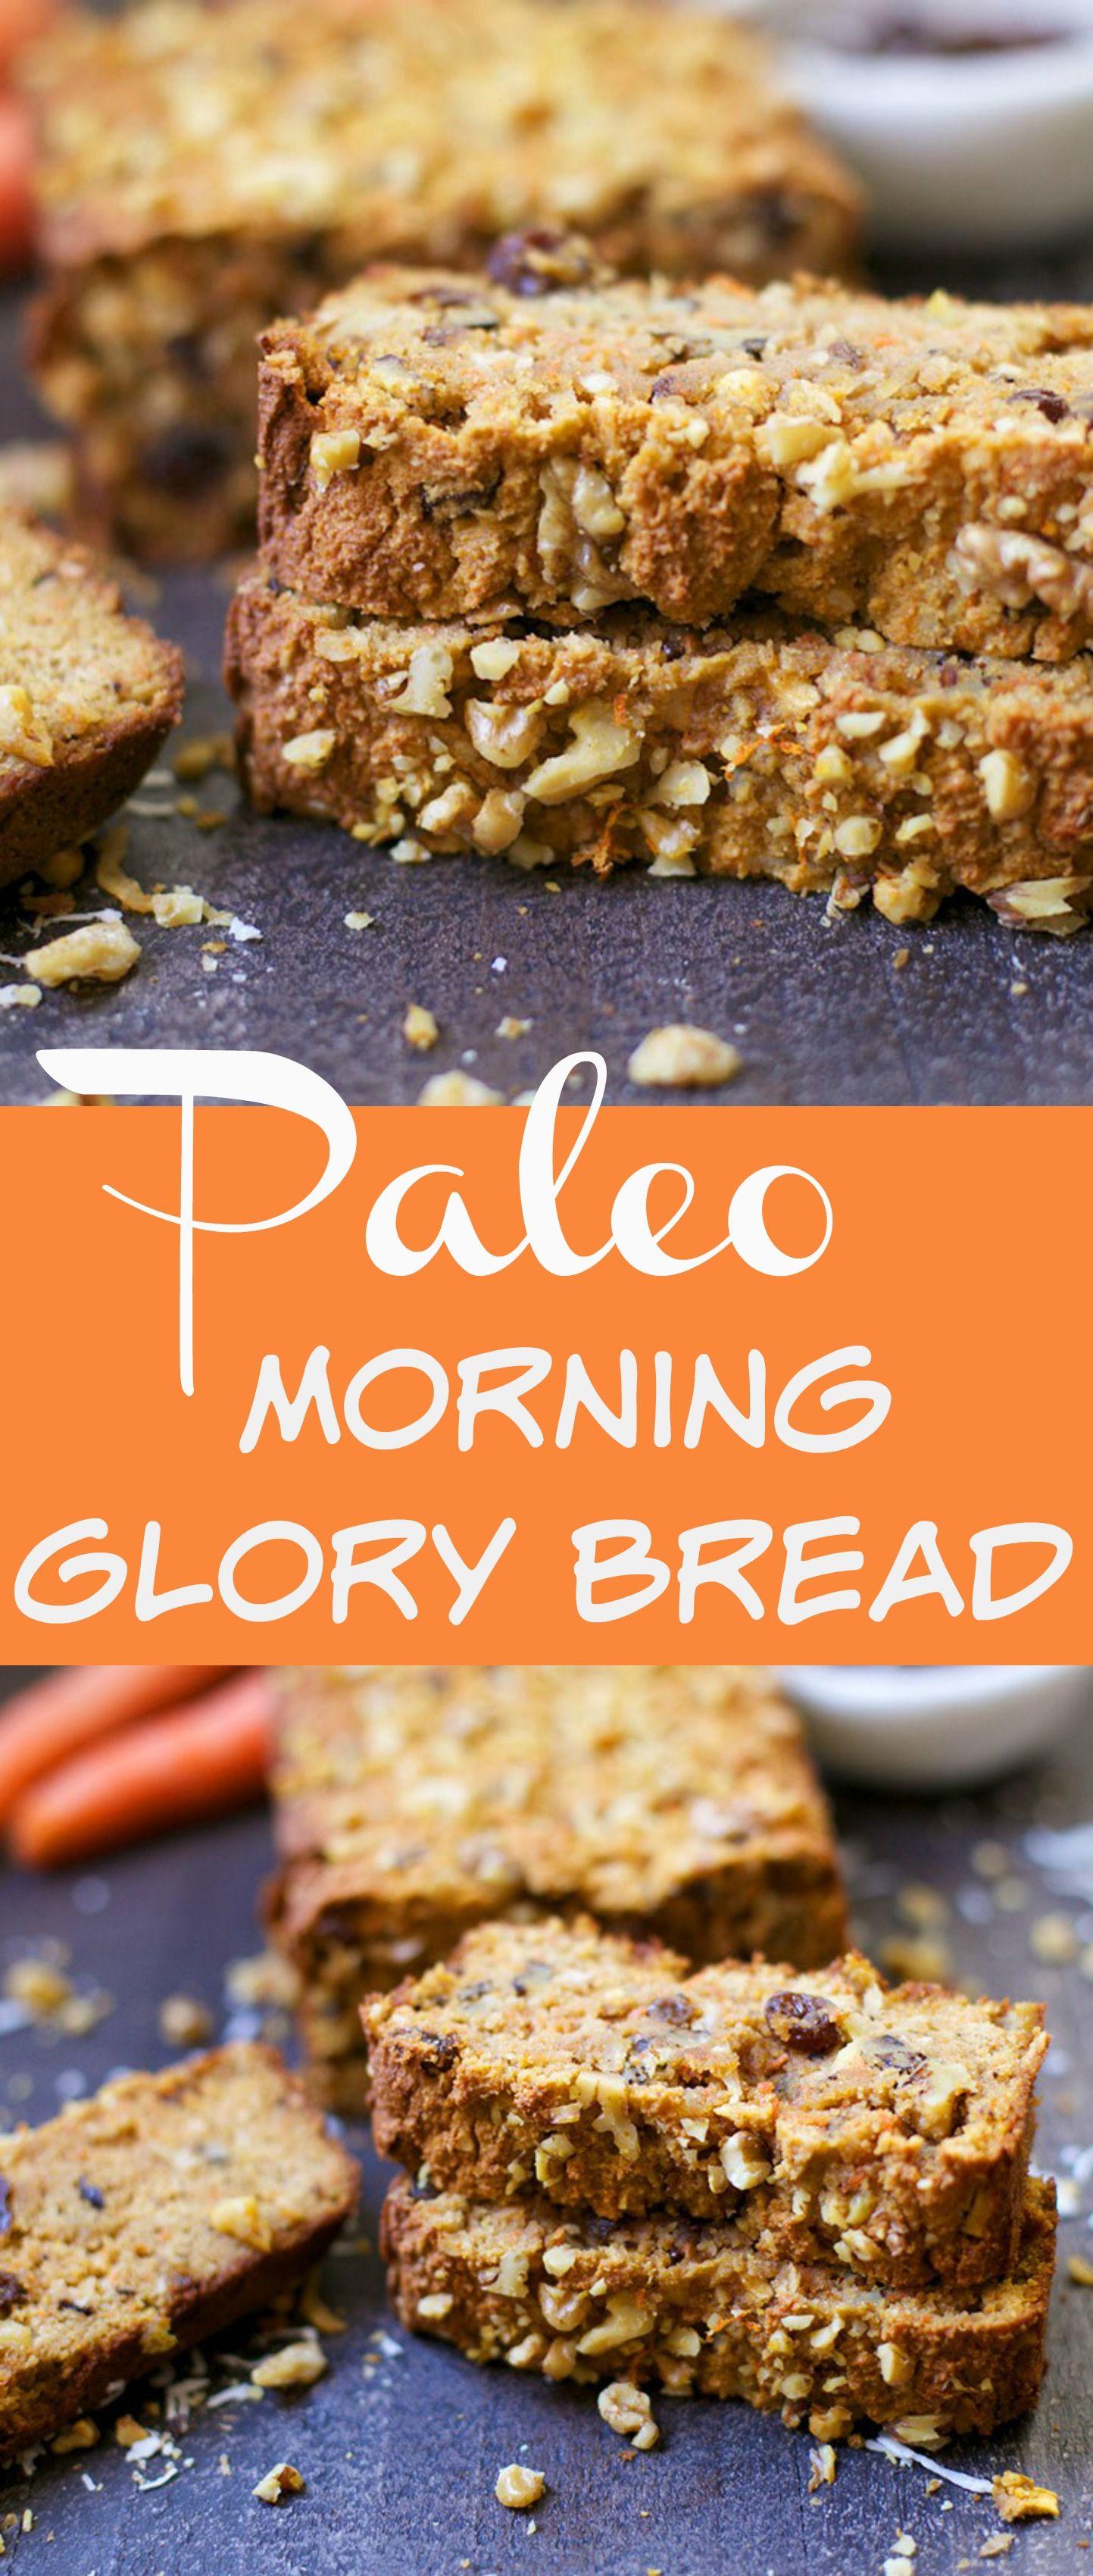 Paleo Morning Glory Bread Recipe Paleo Baking Grain